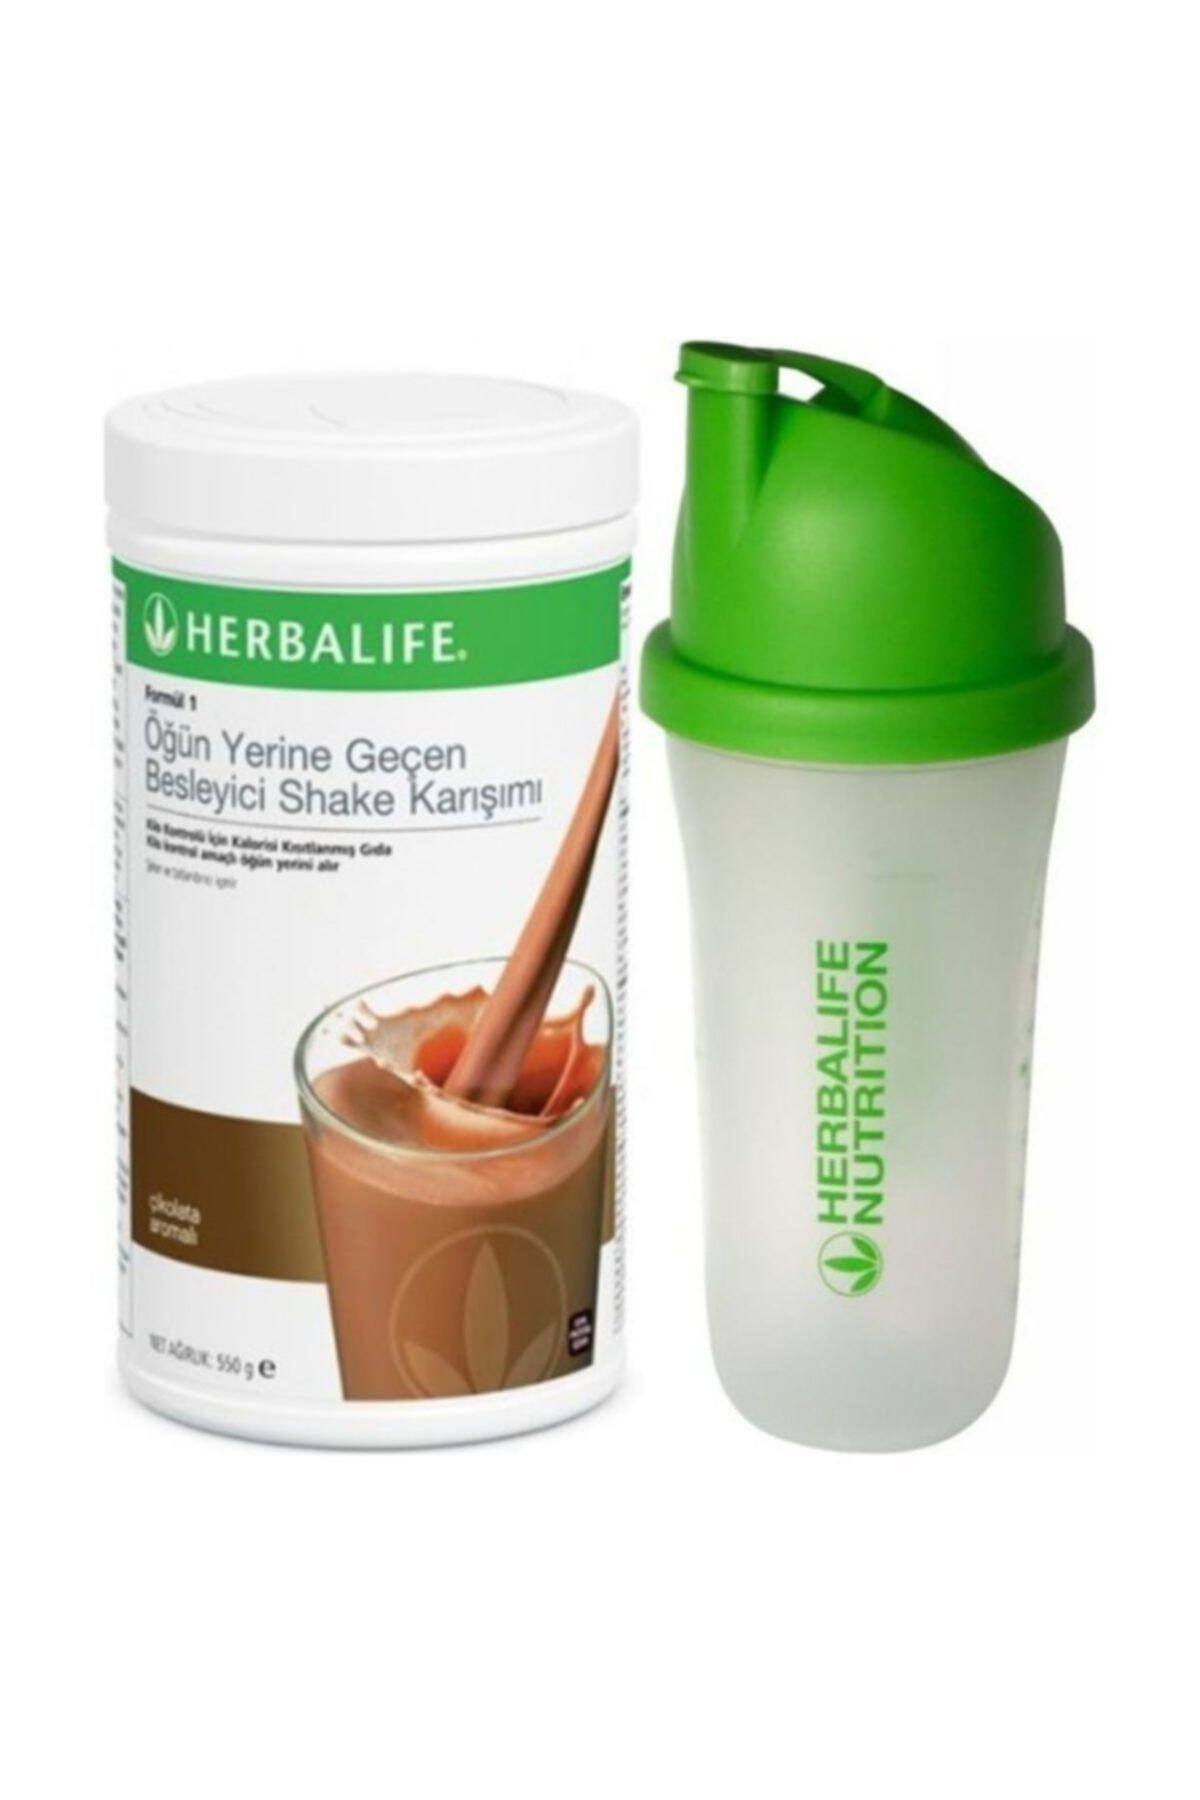 Herbalife Formül 1 Shake 550 Gr + Shaker 1